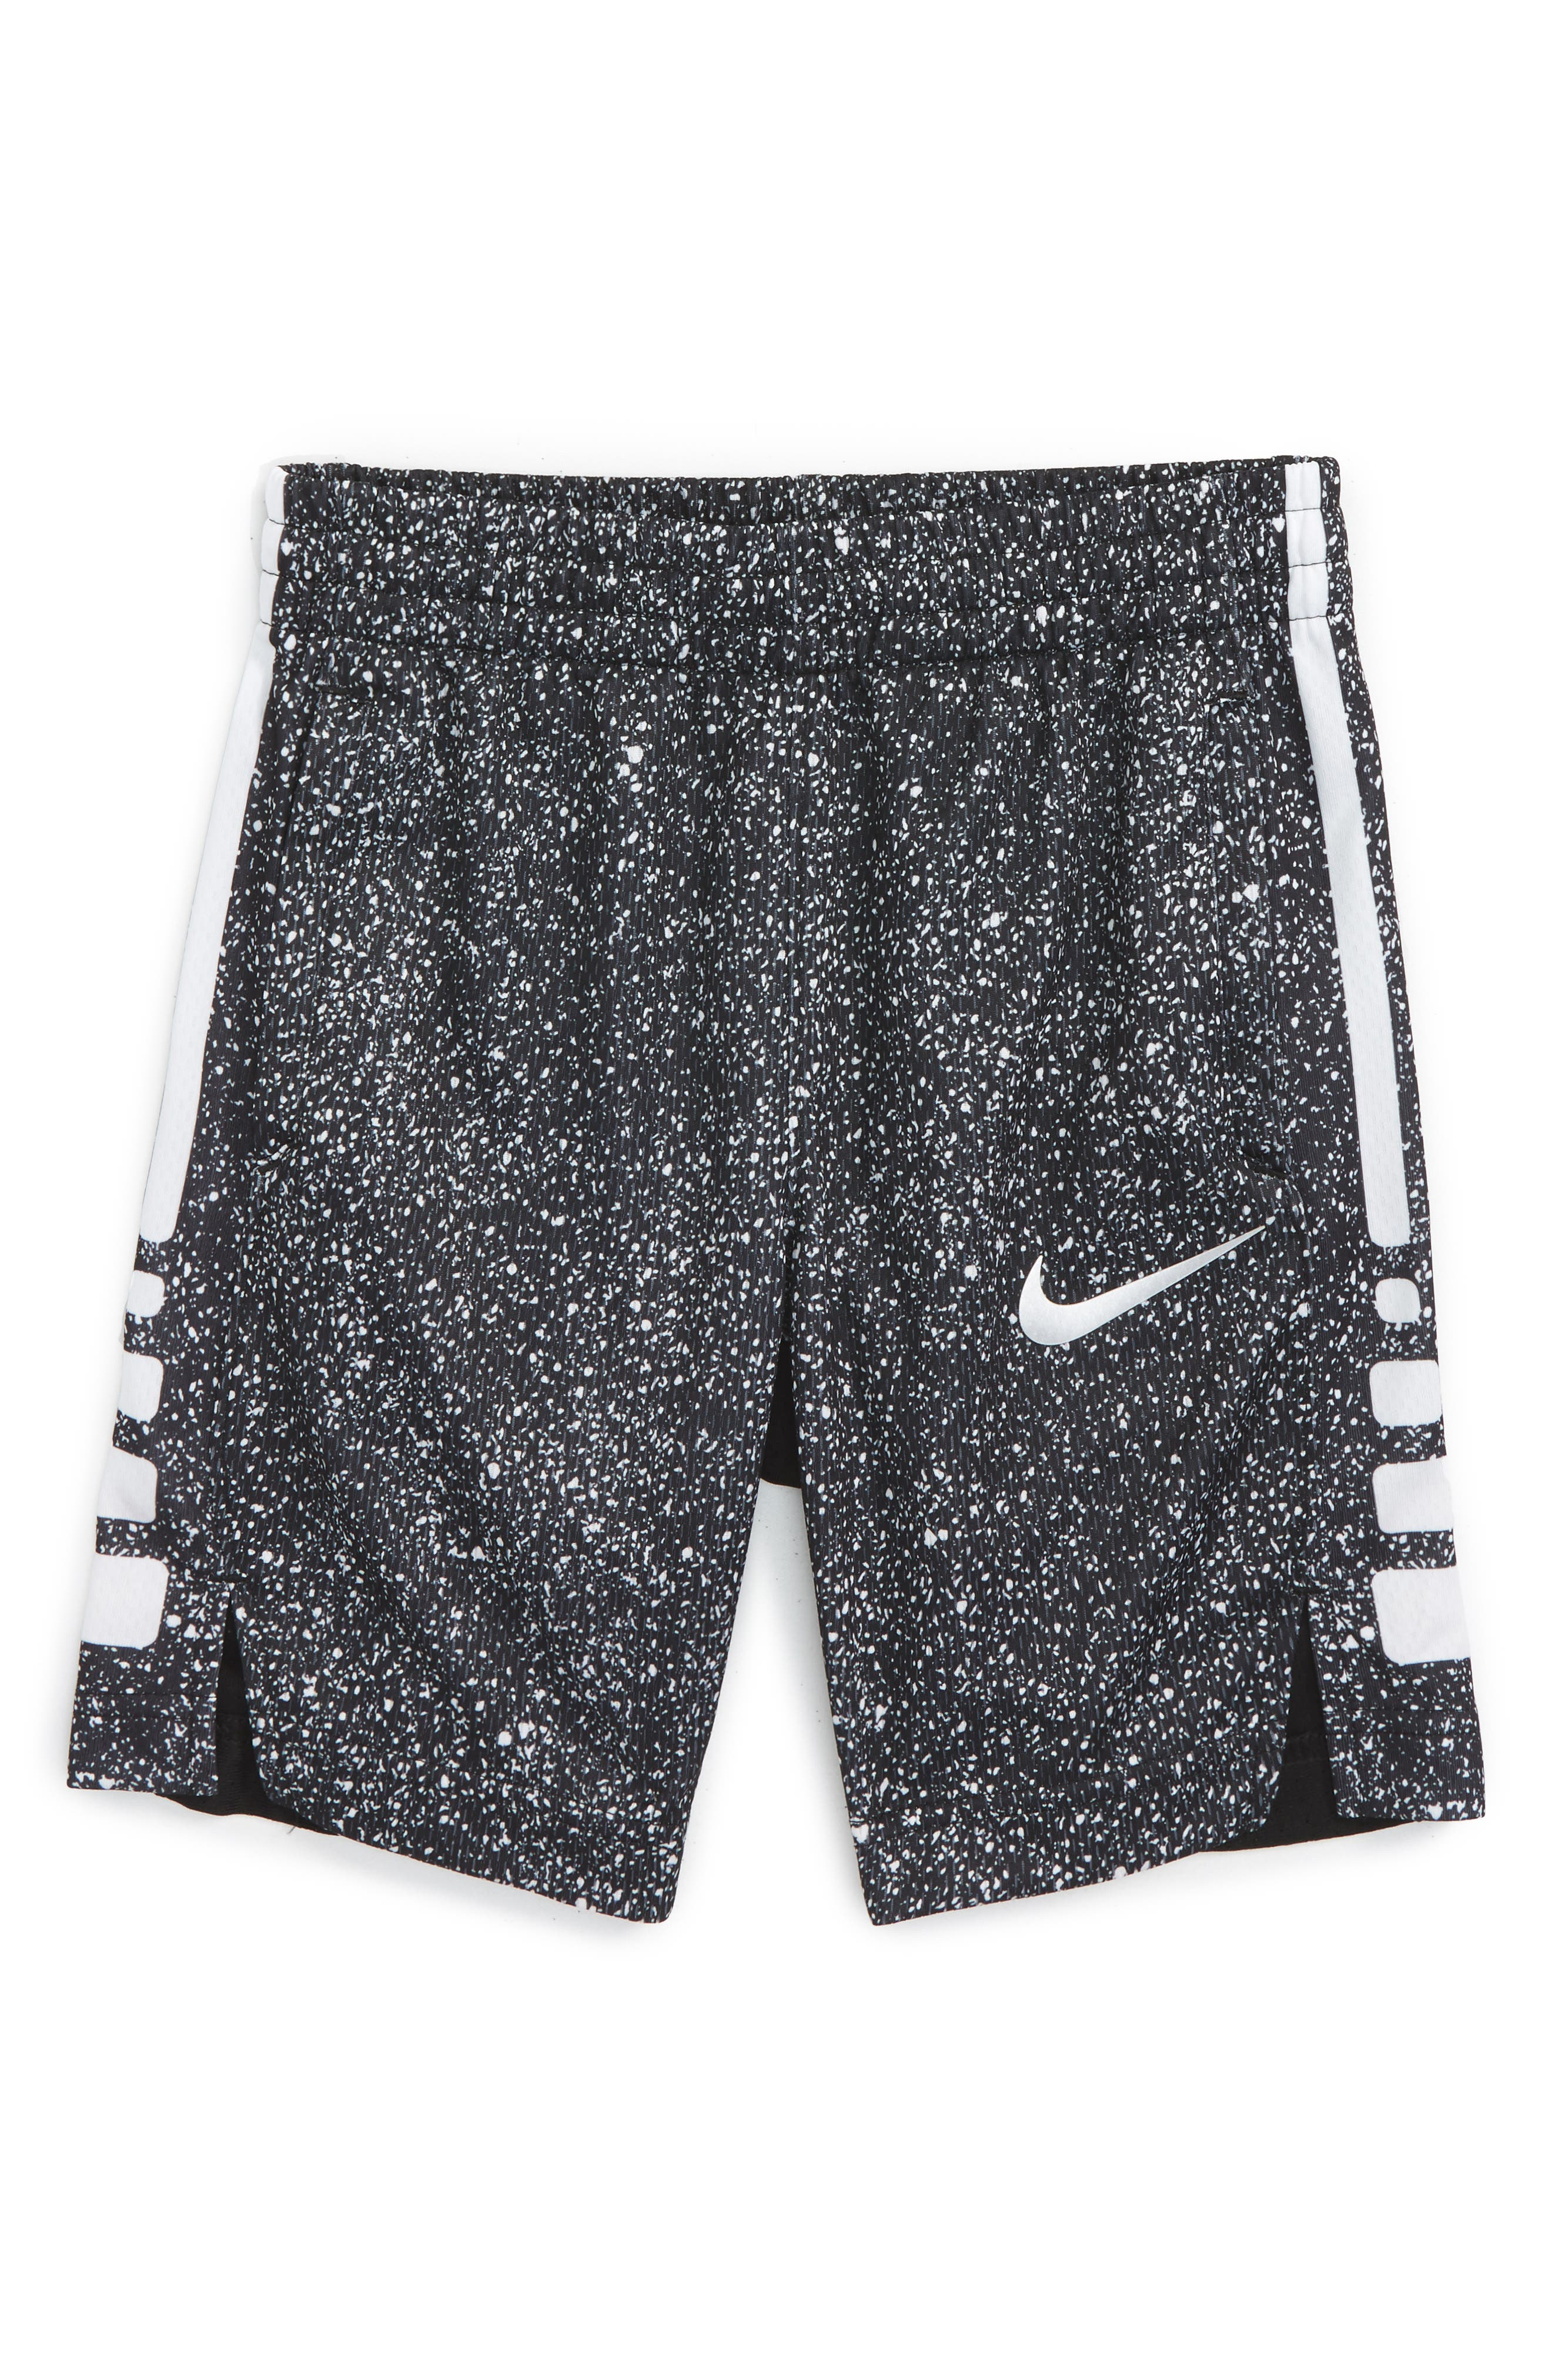 Nike Elite Print Shorts (Toddler Boys & Little Boys)